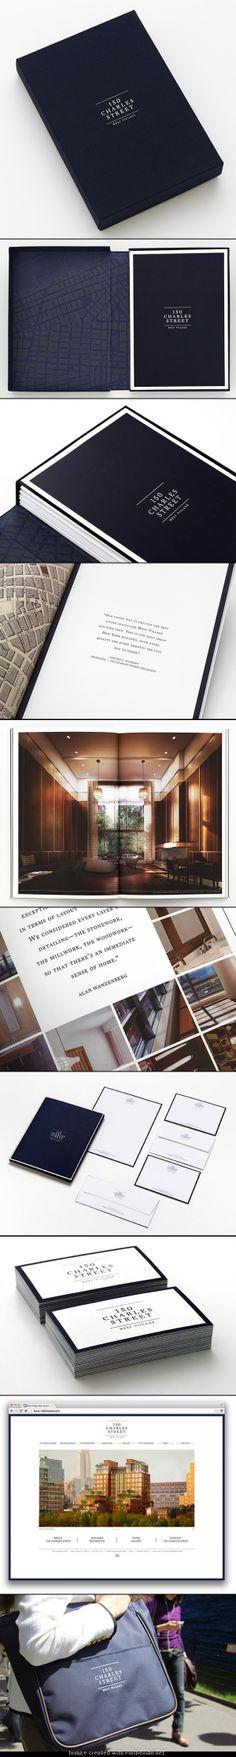 Branding of 150 Charles Street by Pentagram (Creative Director: Michael Bierut / Designer: Jesse Reid) Design Layouts, Brochure Design, Michael Bierut, Property Branding, Editorial Design, Creative Director, Brand Identity, Real Estate